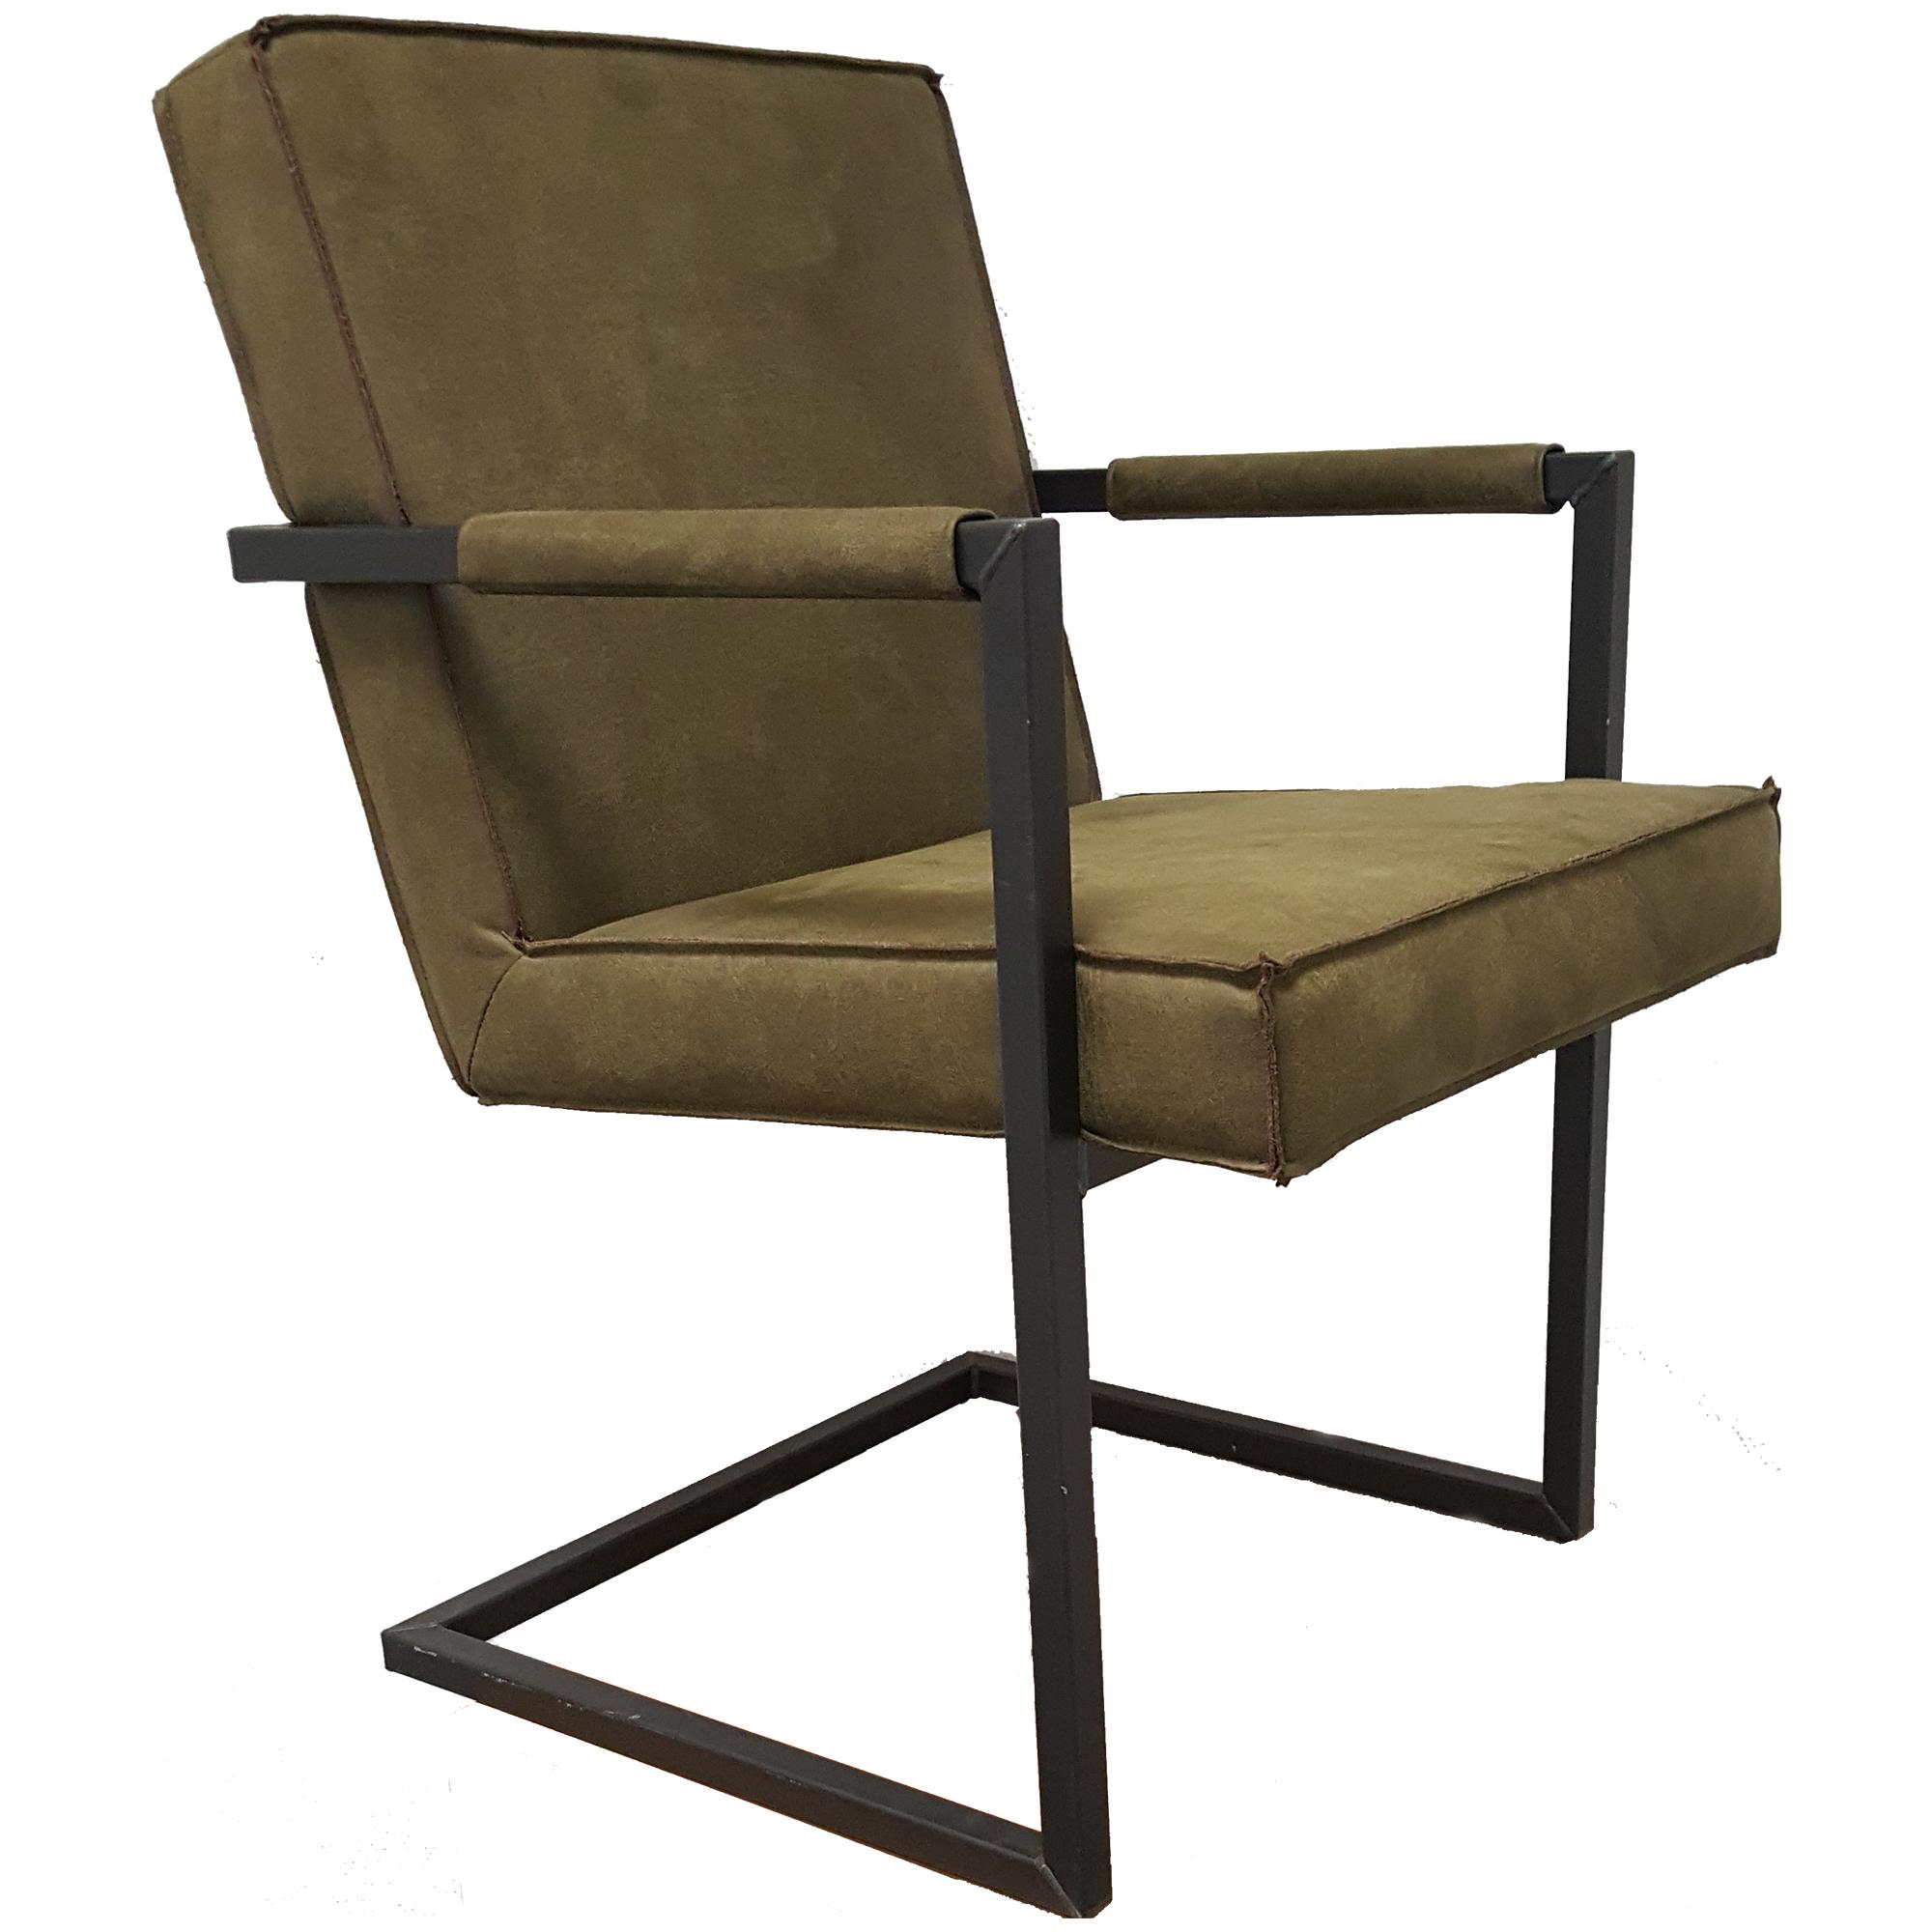 Echtleder Esszimmerstühle mit Armlehnen  Echt Leder Sessel Stühle Lederstühle